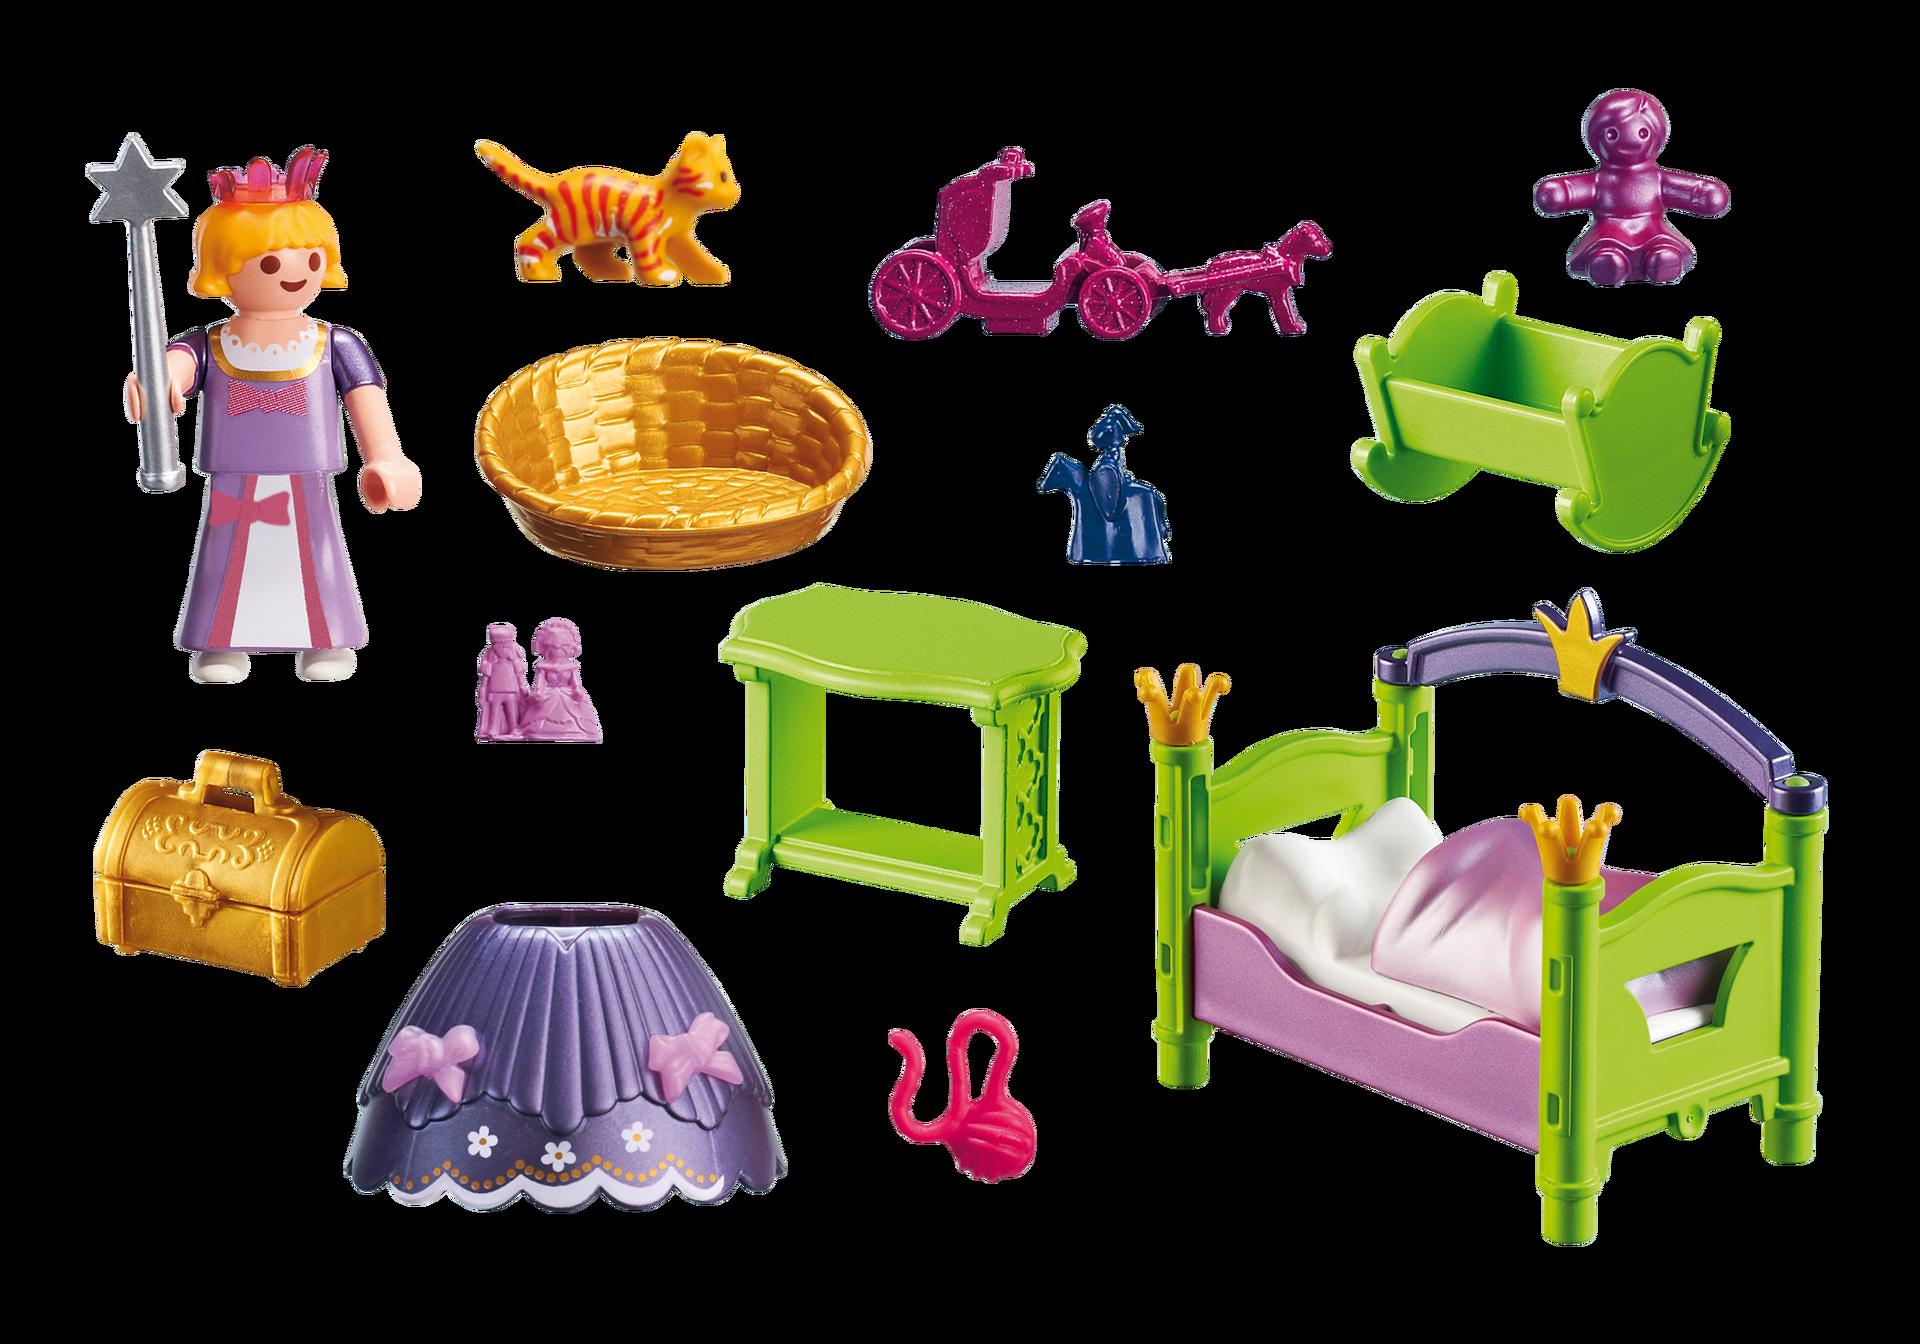 Prinzessinnen kinderzimmer 6852 playmobil deutschland for Kinderzimmer playmobil